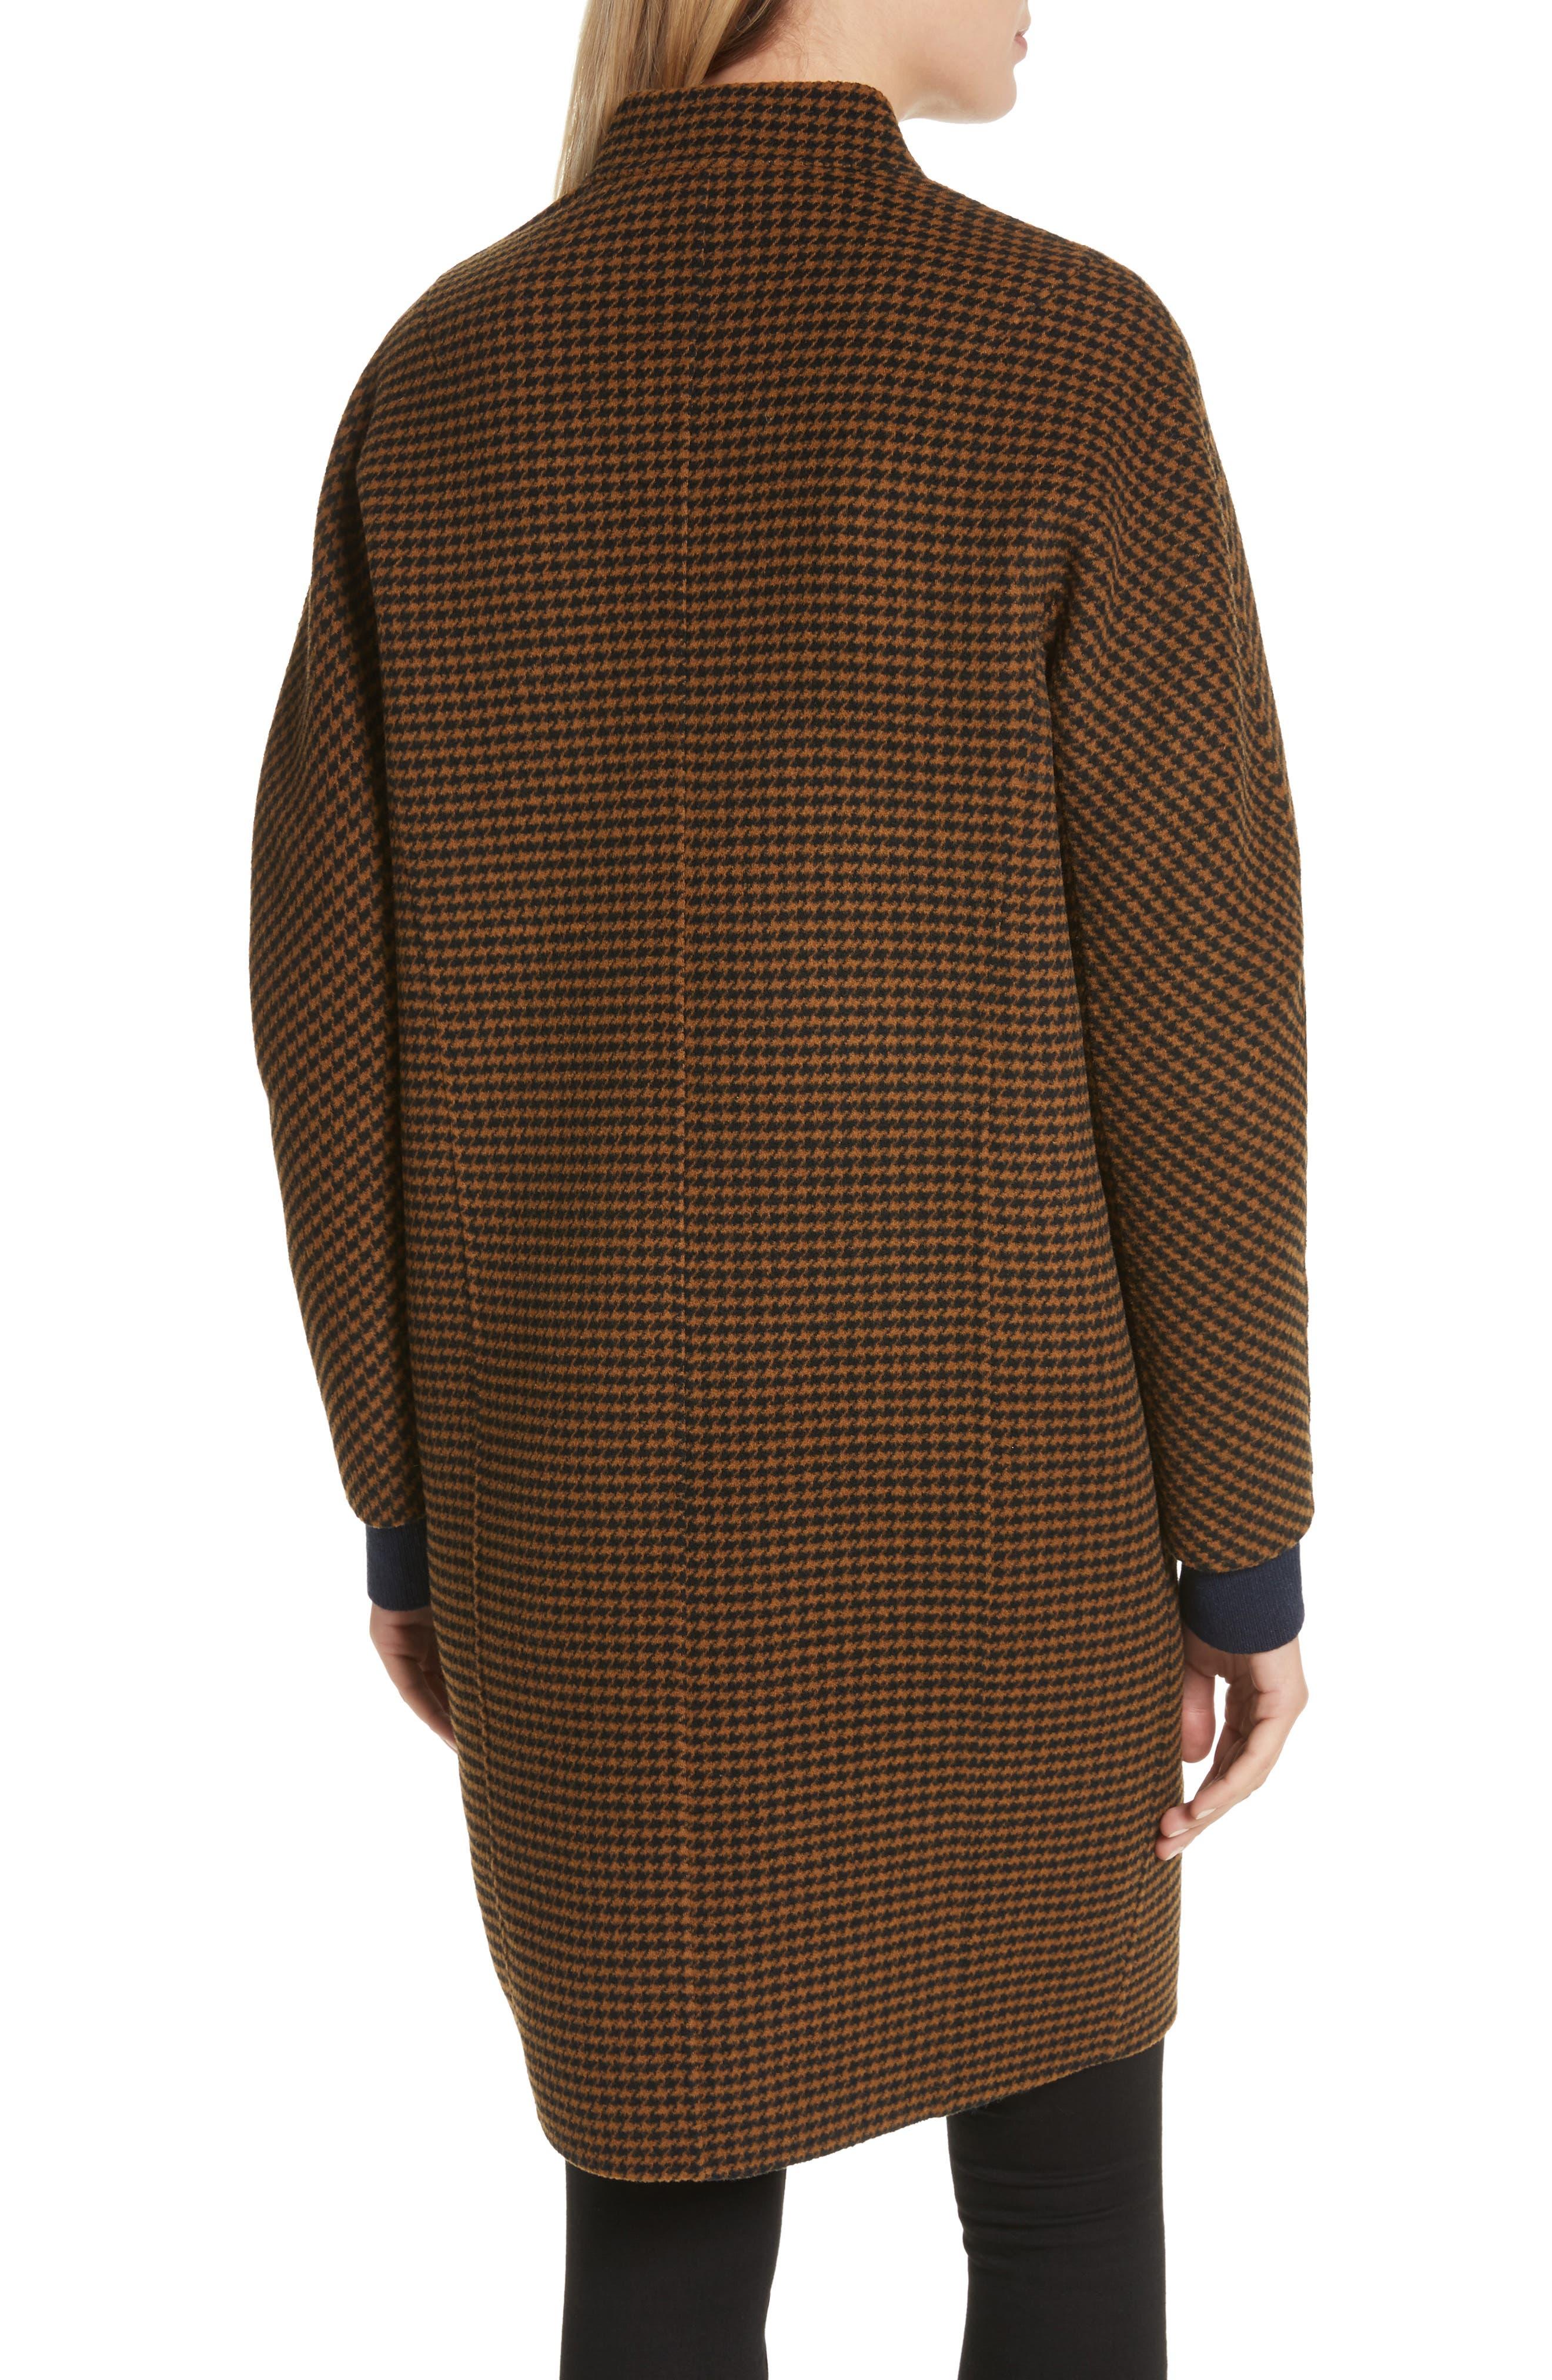 Darwen Reversible Wool & Cashmere Coat,                             Alternate thumbnail 4, color,                             Brown/Black